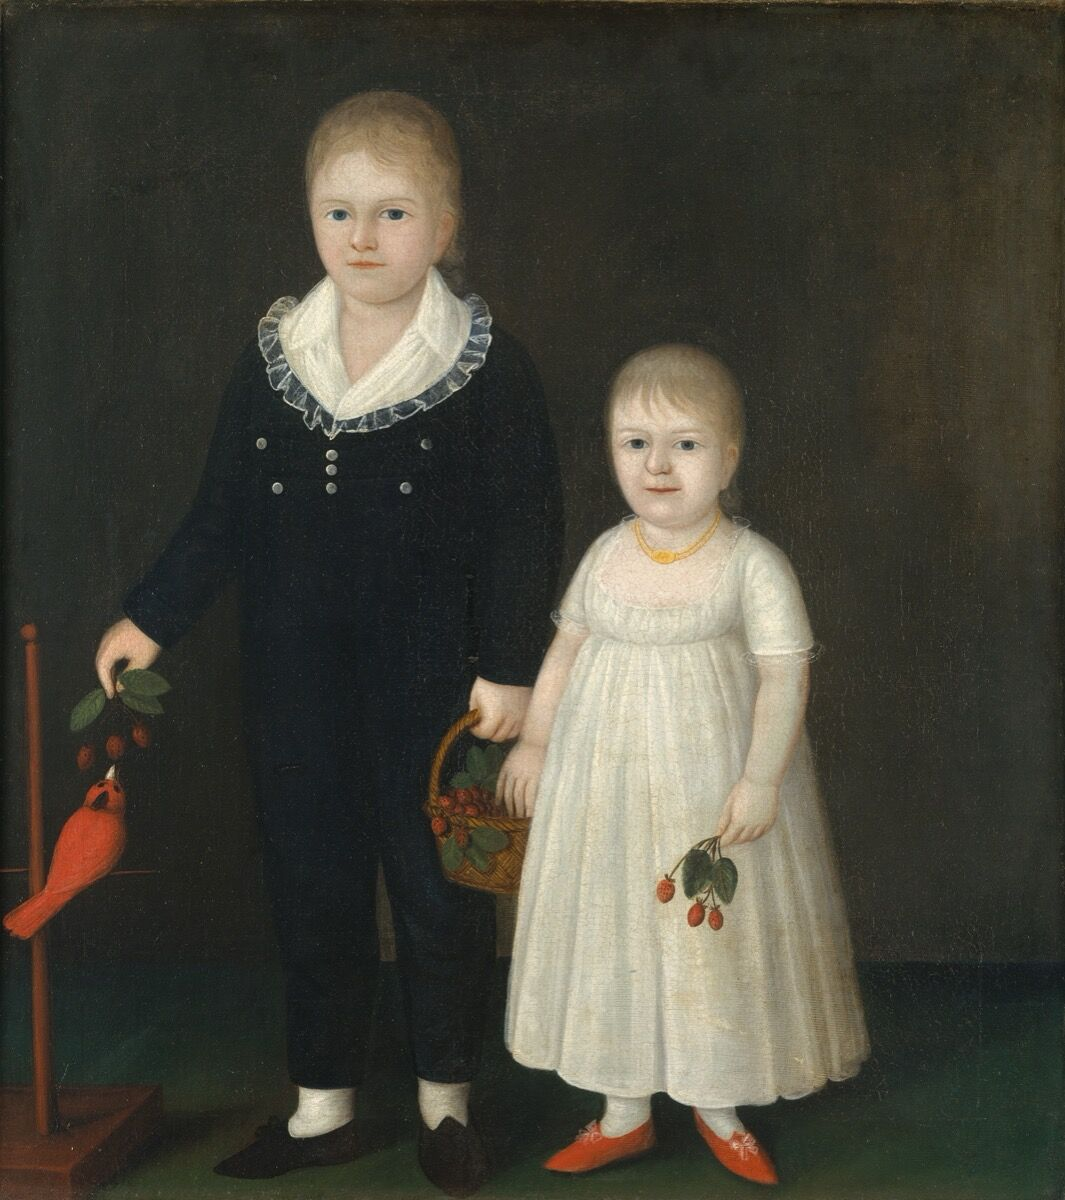 Joshua Johnson, Edward and Sarah Rutter, c. 1805. Courtesy of Metropolitan Museum of Art.